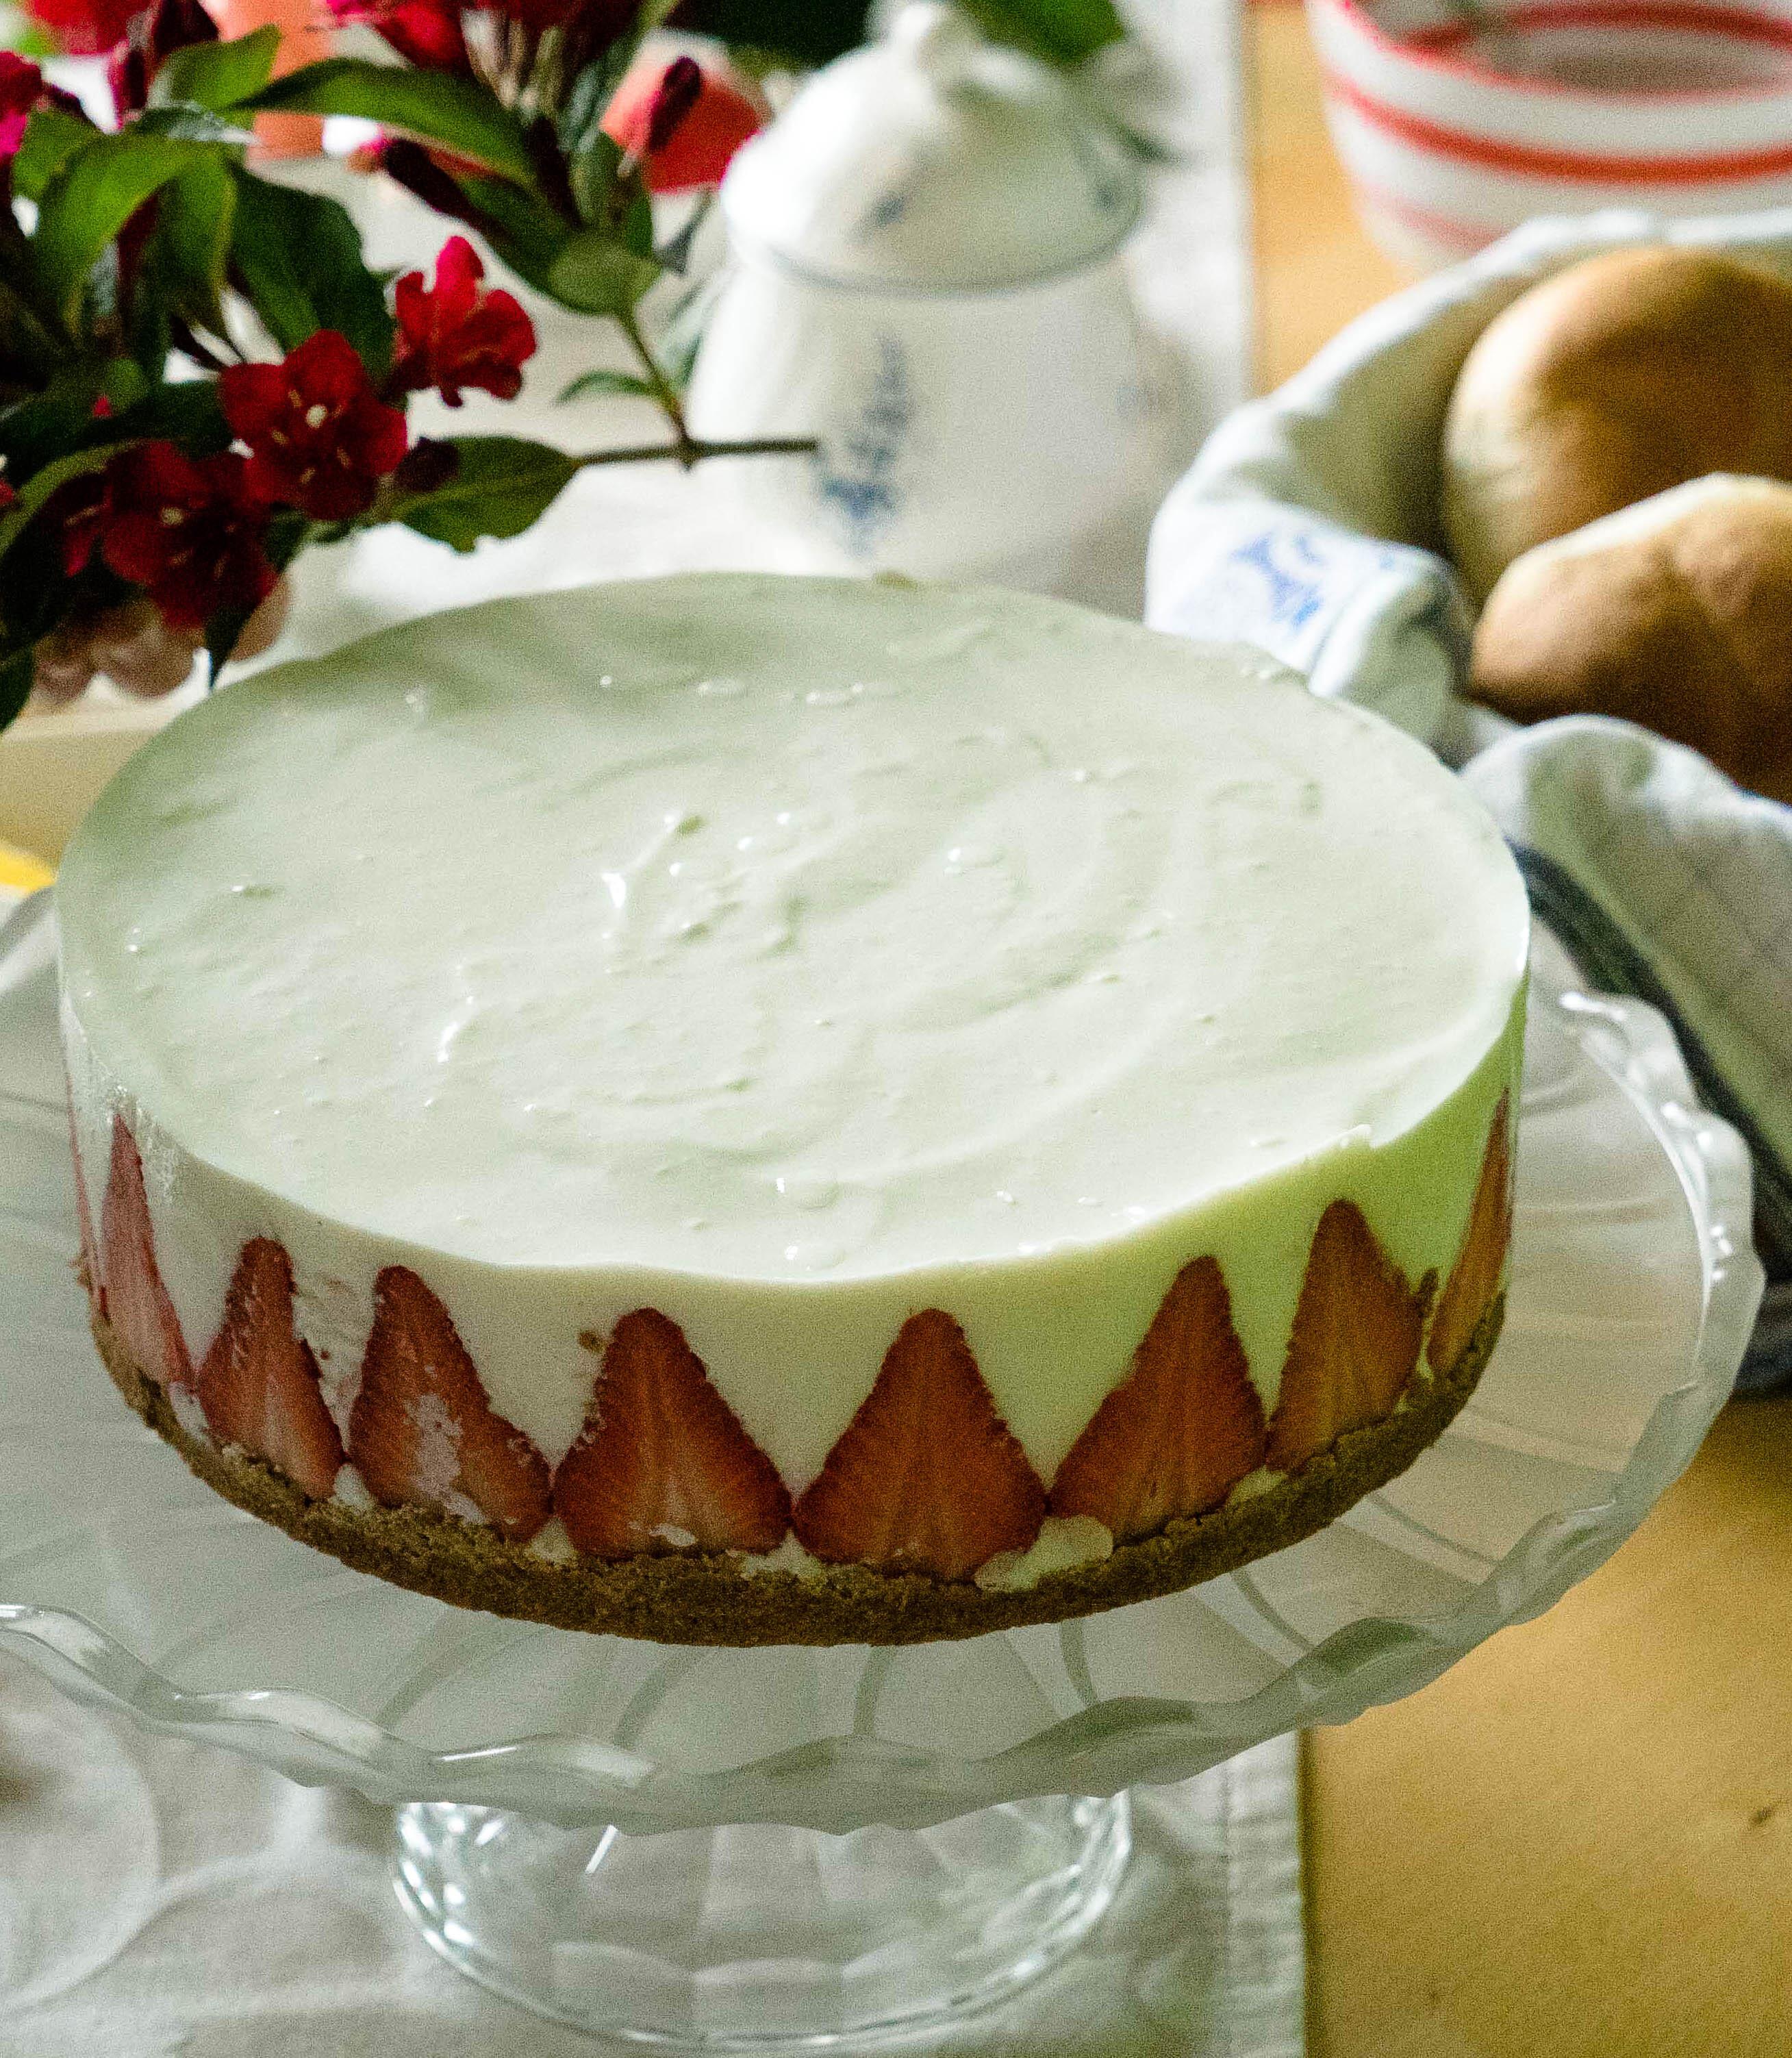 Cremige Erdbeer Überraschungstorte I False Strawberry Cheesecake